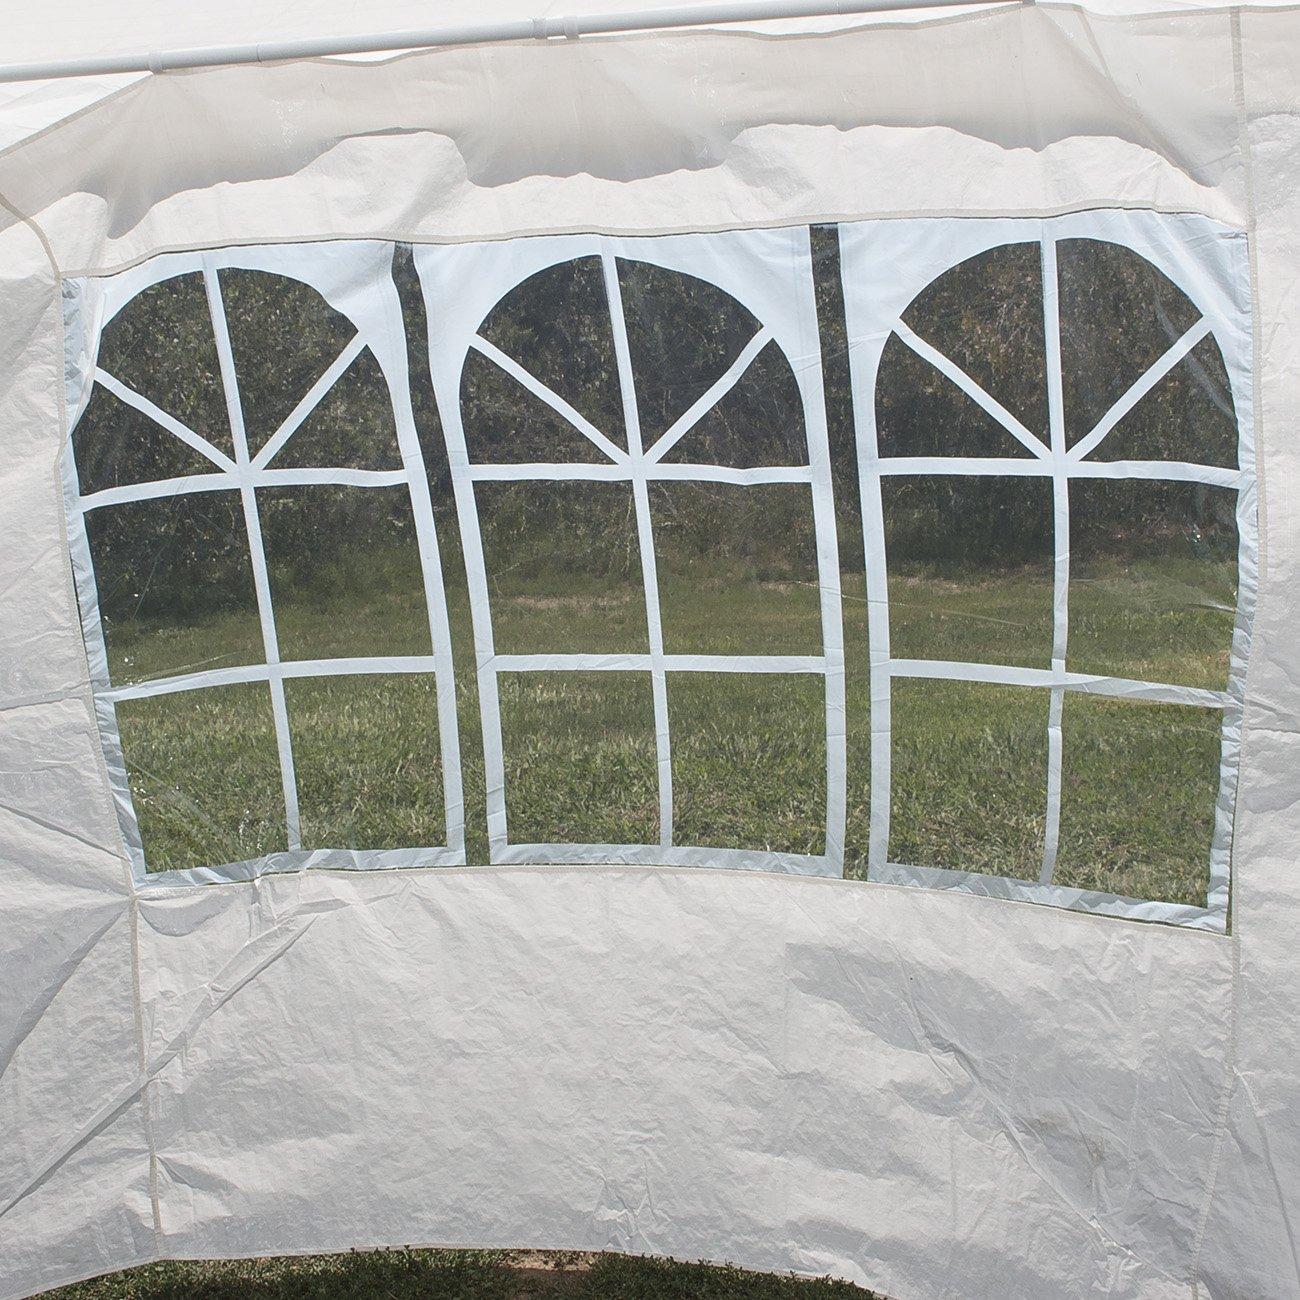 amazon com belleze 10 u0027x30 u0027 canopy party wedding outdoor tent